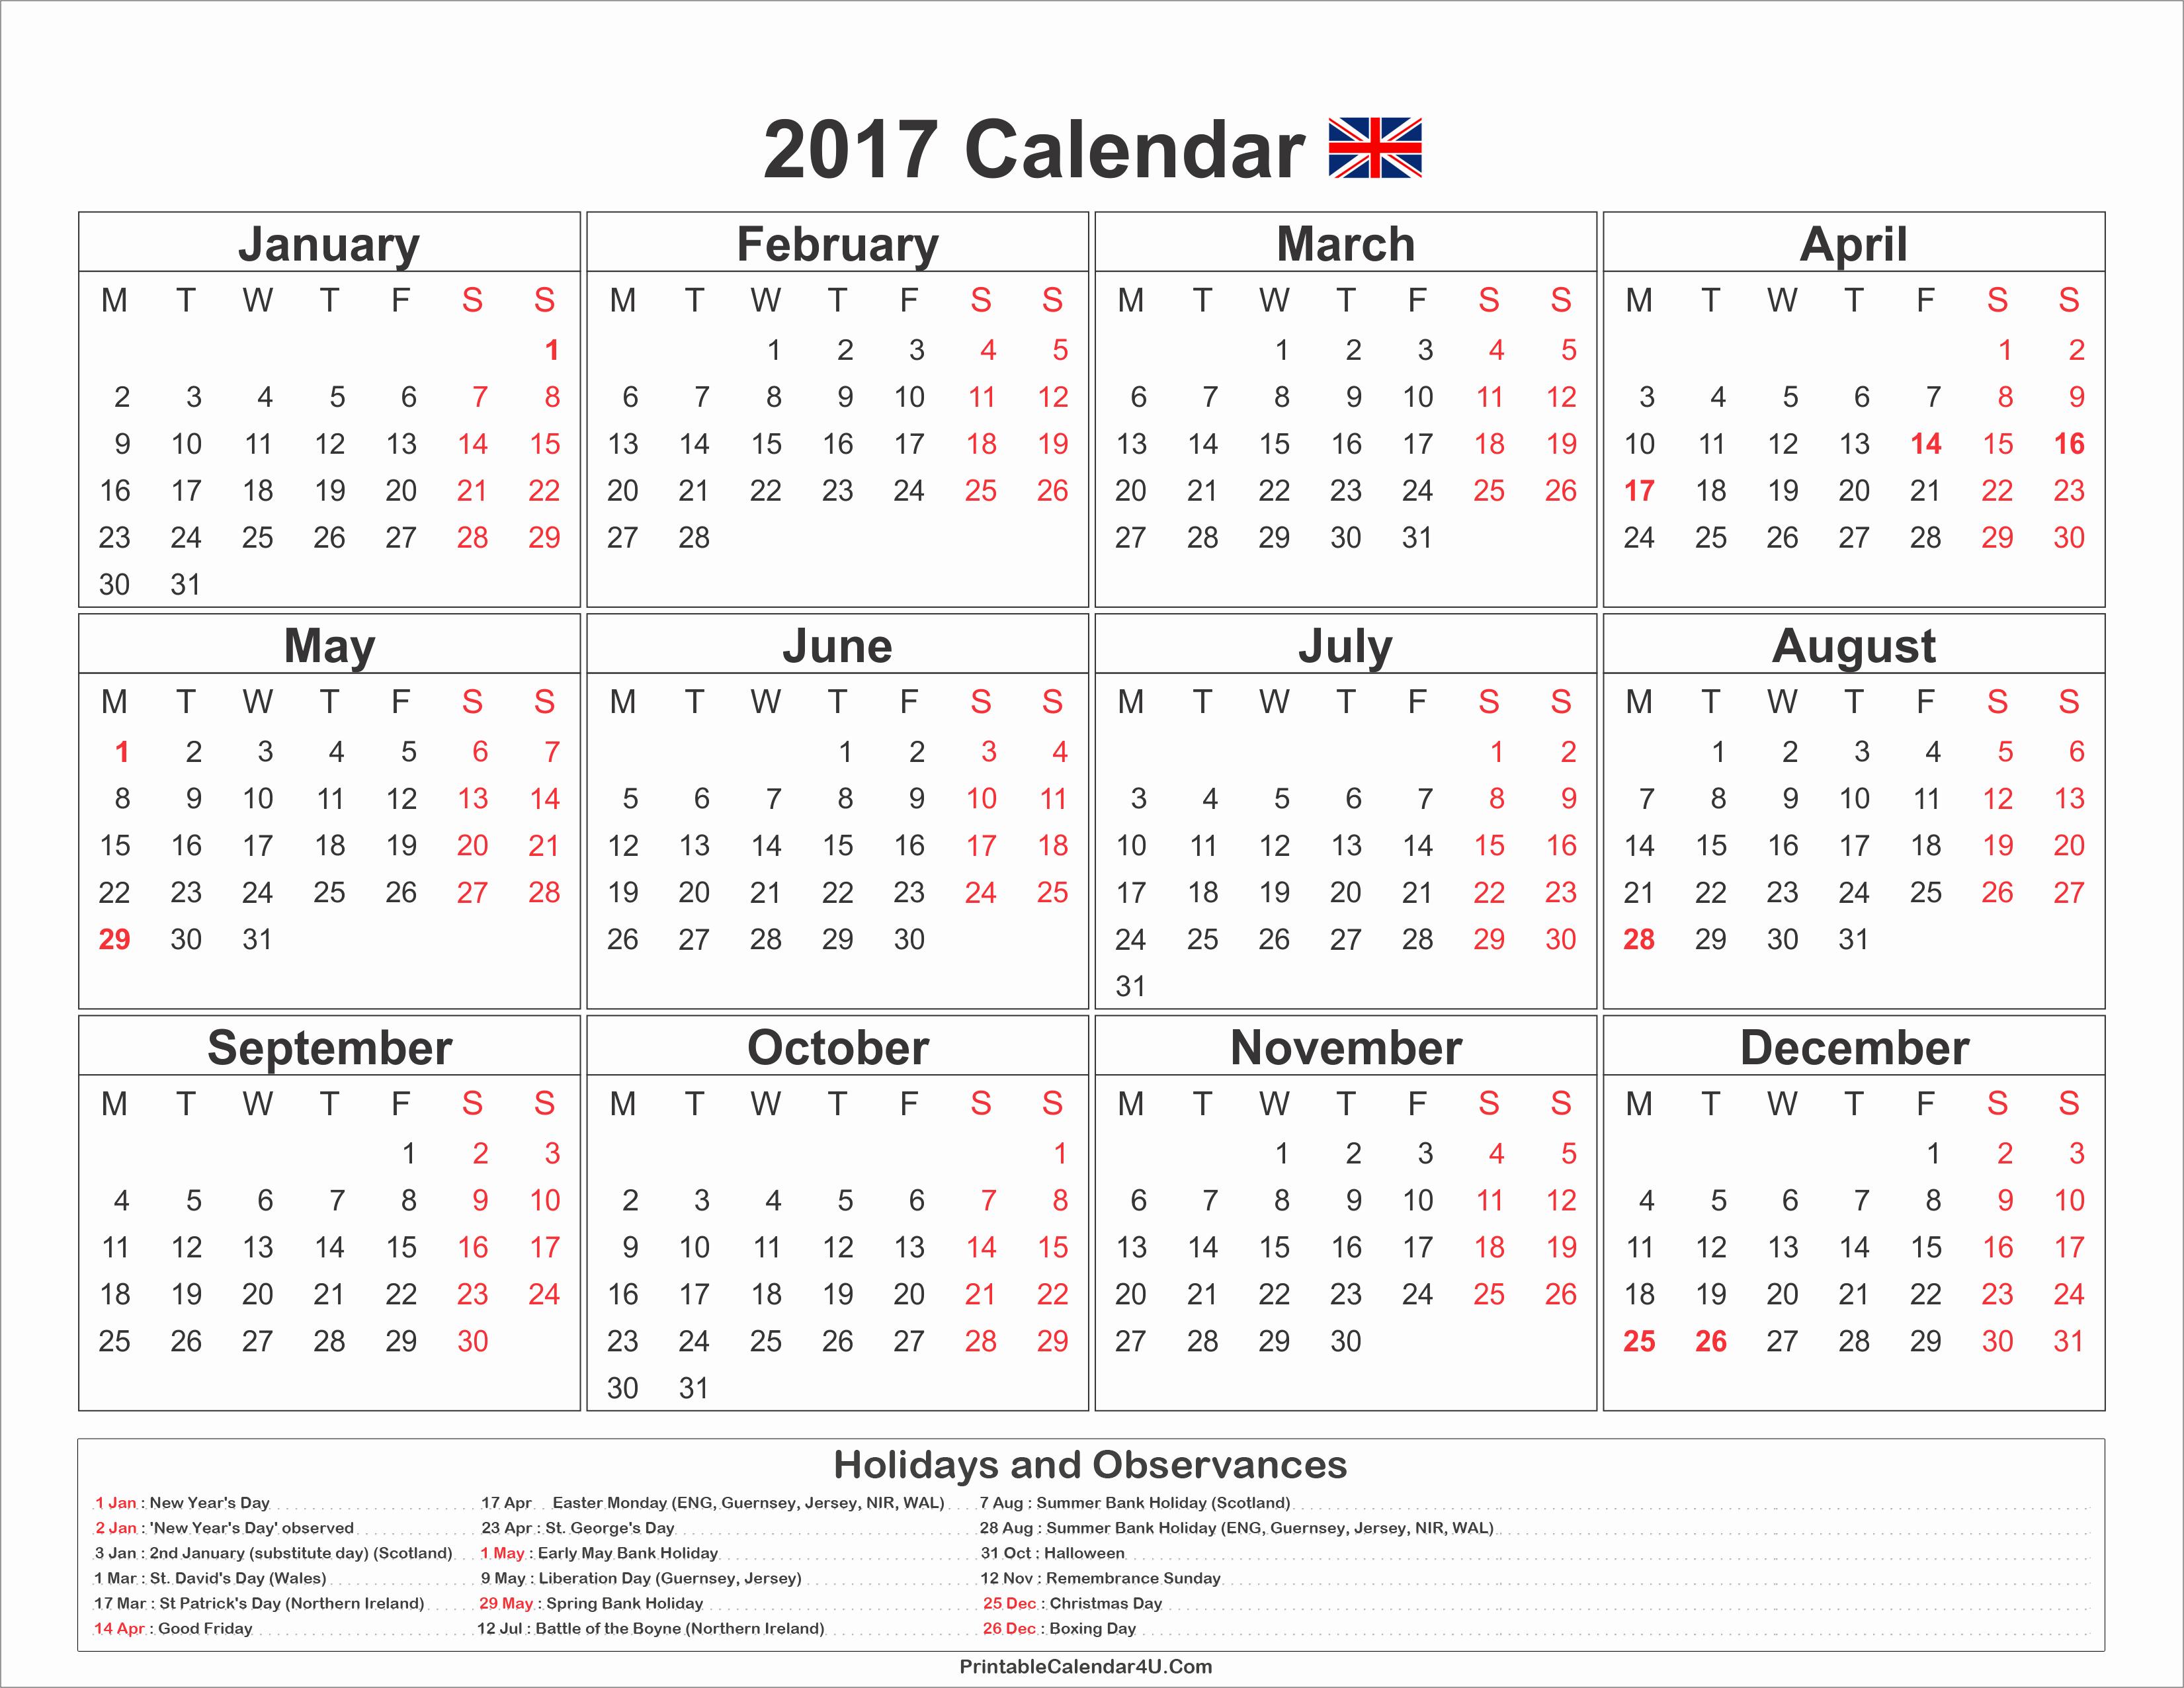 2017 Year Calendar Printable Free Unique 2017 Calendar Uk with Holidays Free Printable Calendar 2017